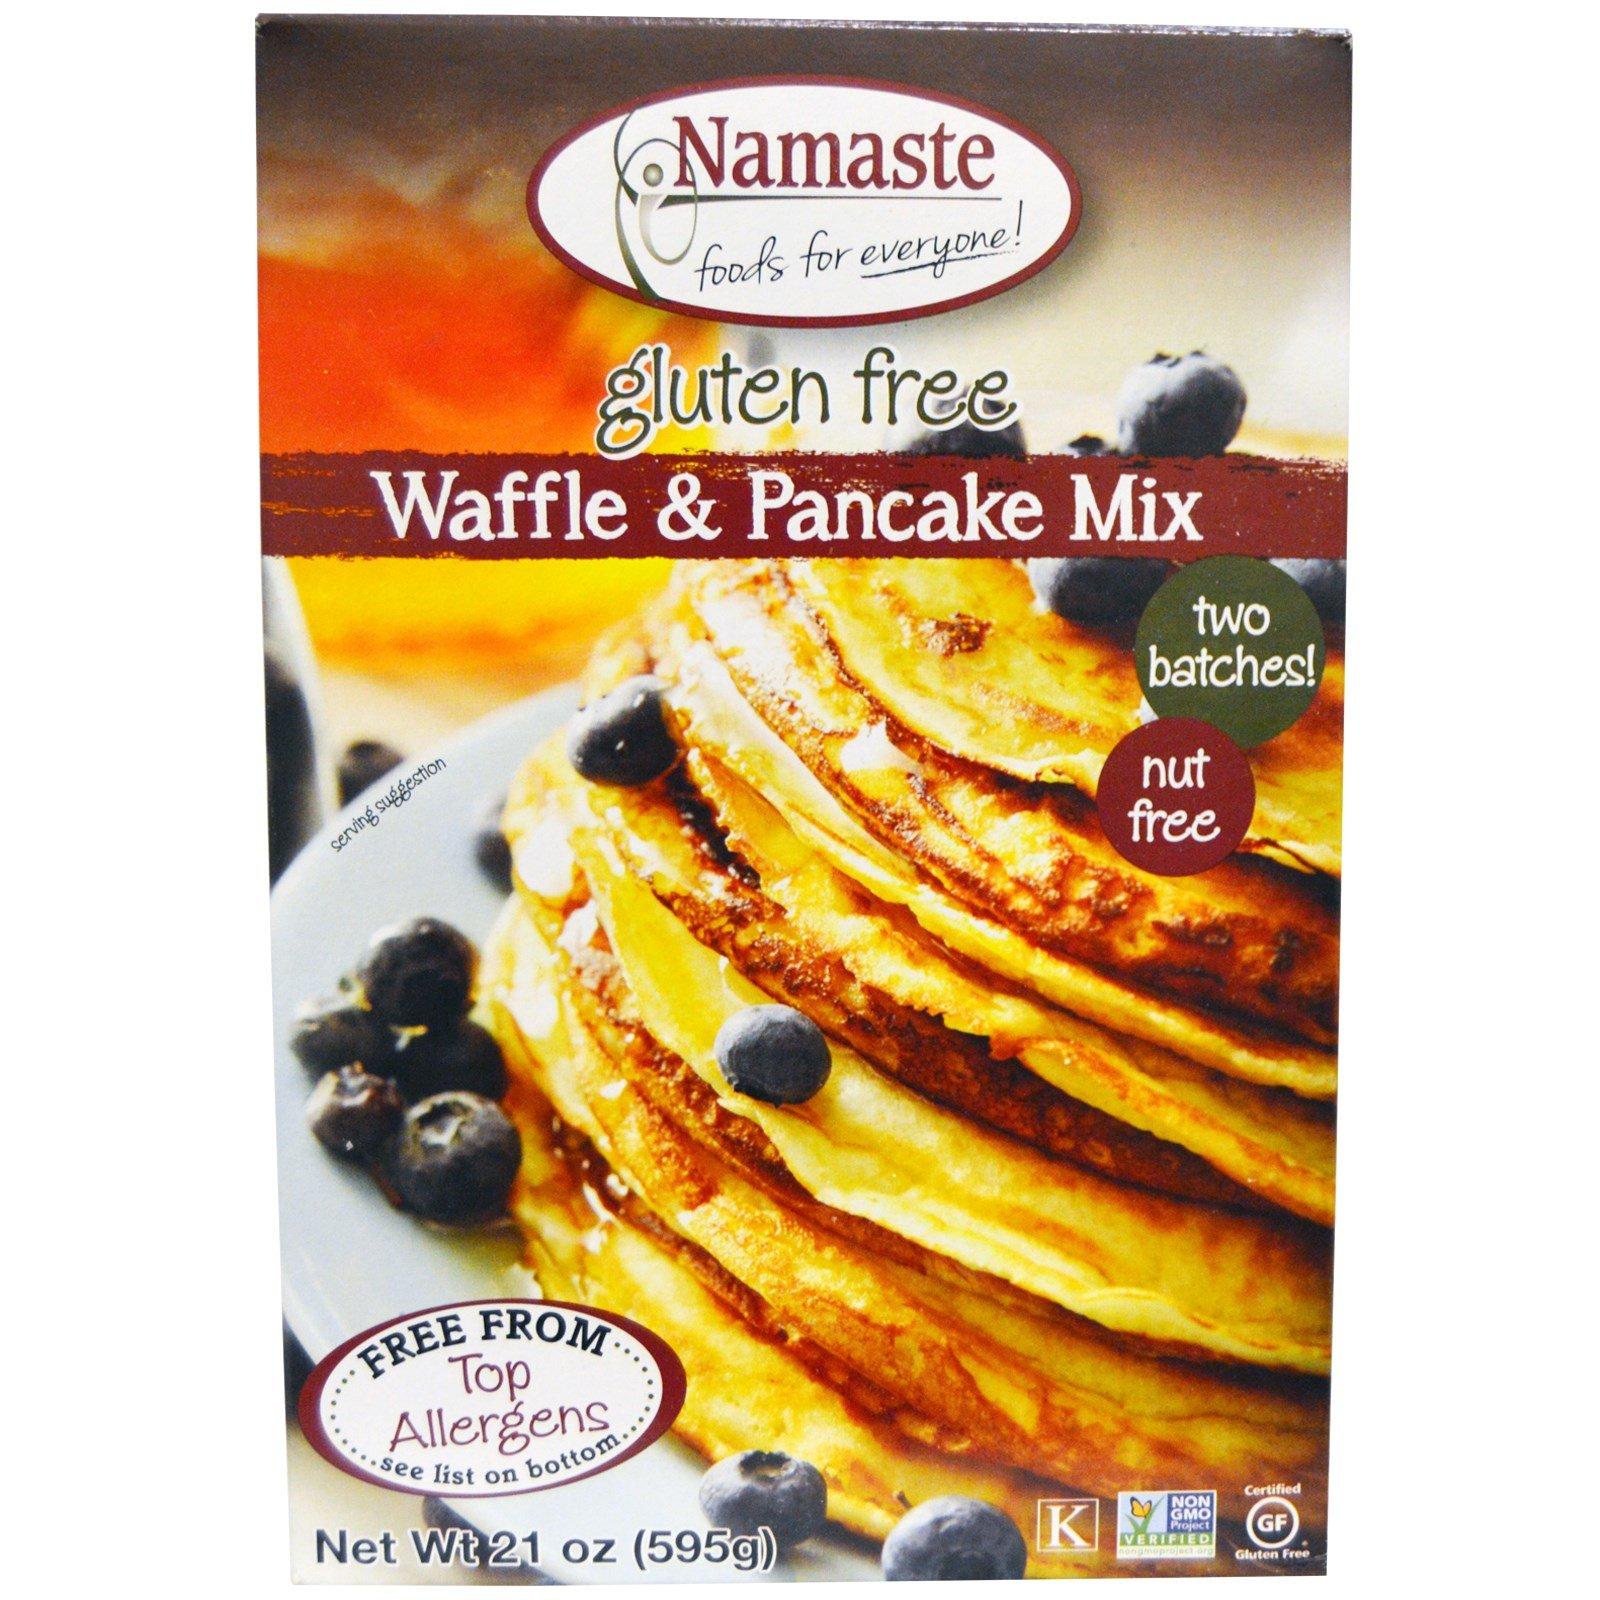 Namaste Foods, Gluten Free Waffle & Pancake Mix, 21 oz (595 g) Namaste Foods, Gluten Free Waffle & Pancake Mix, 21 oz (595 g) - 2pcs